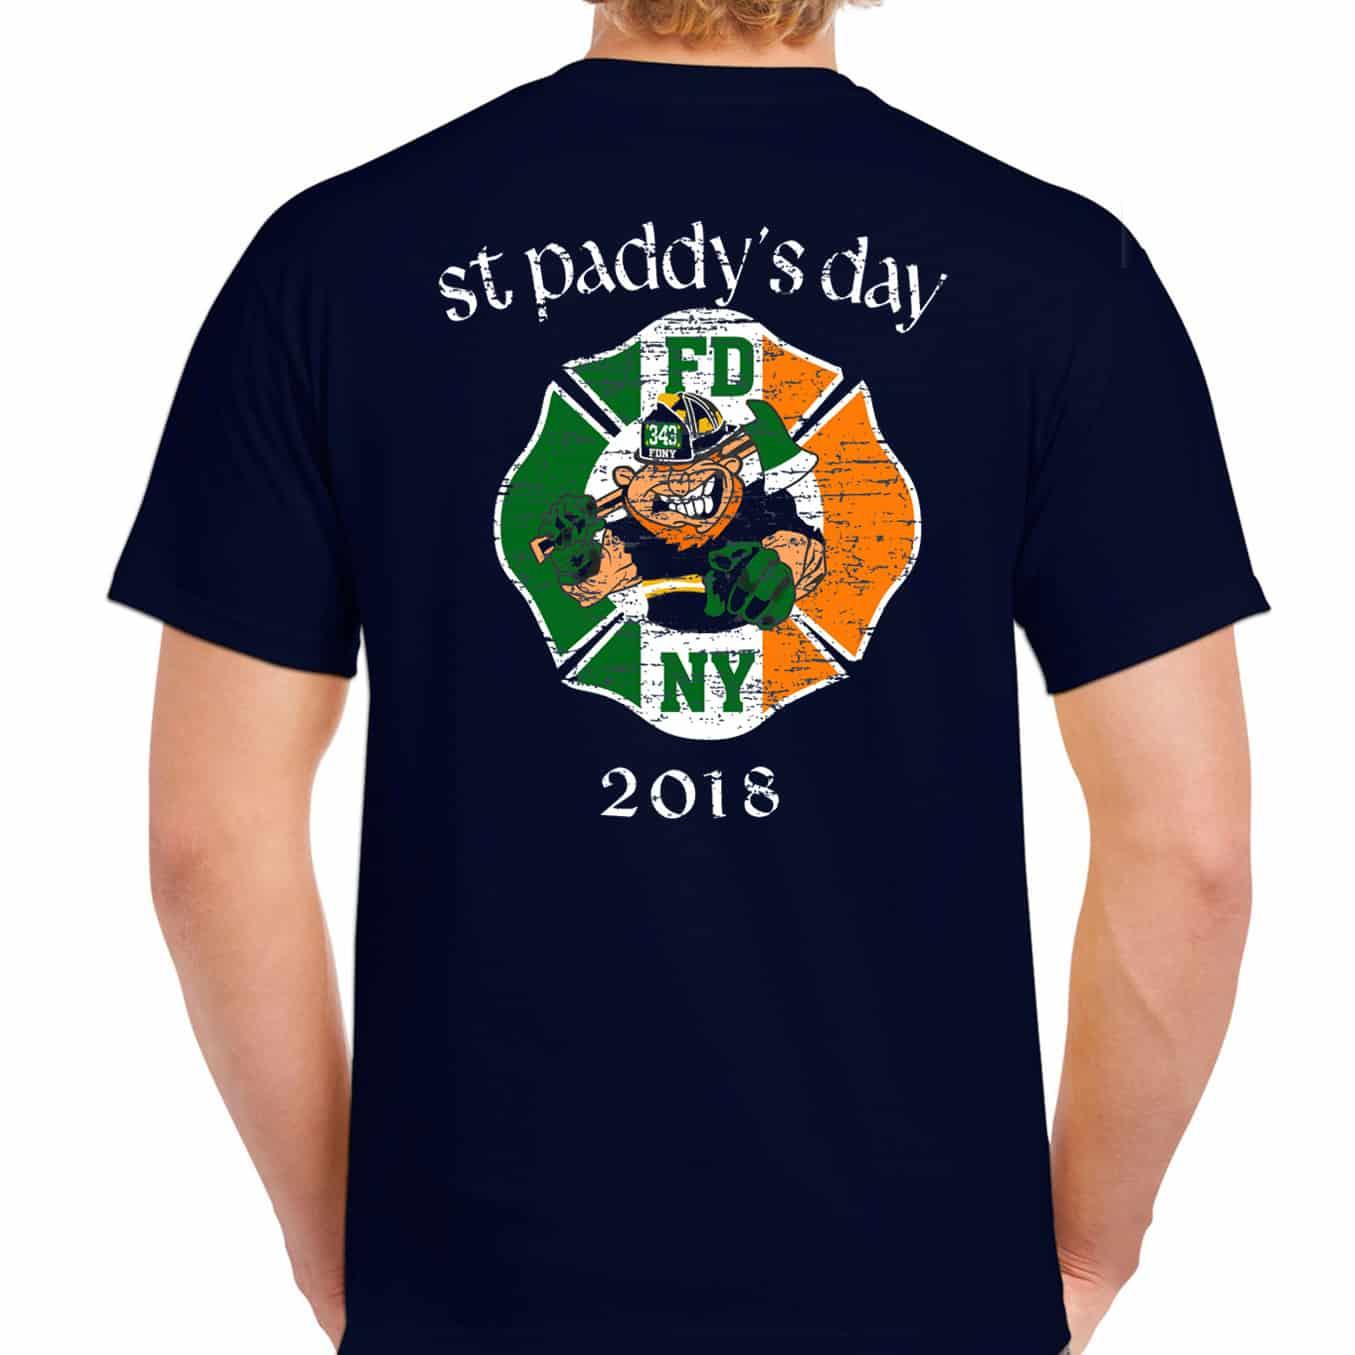 7add9b028 FDNY ST. PATRICK'S DAY 2018 T-SHIRT – FDNY Shop